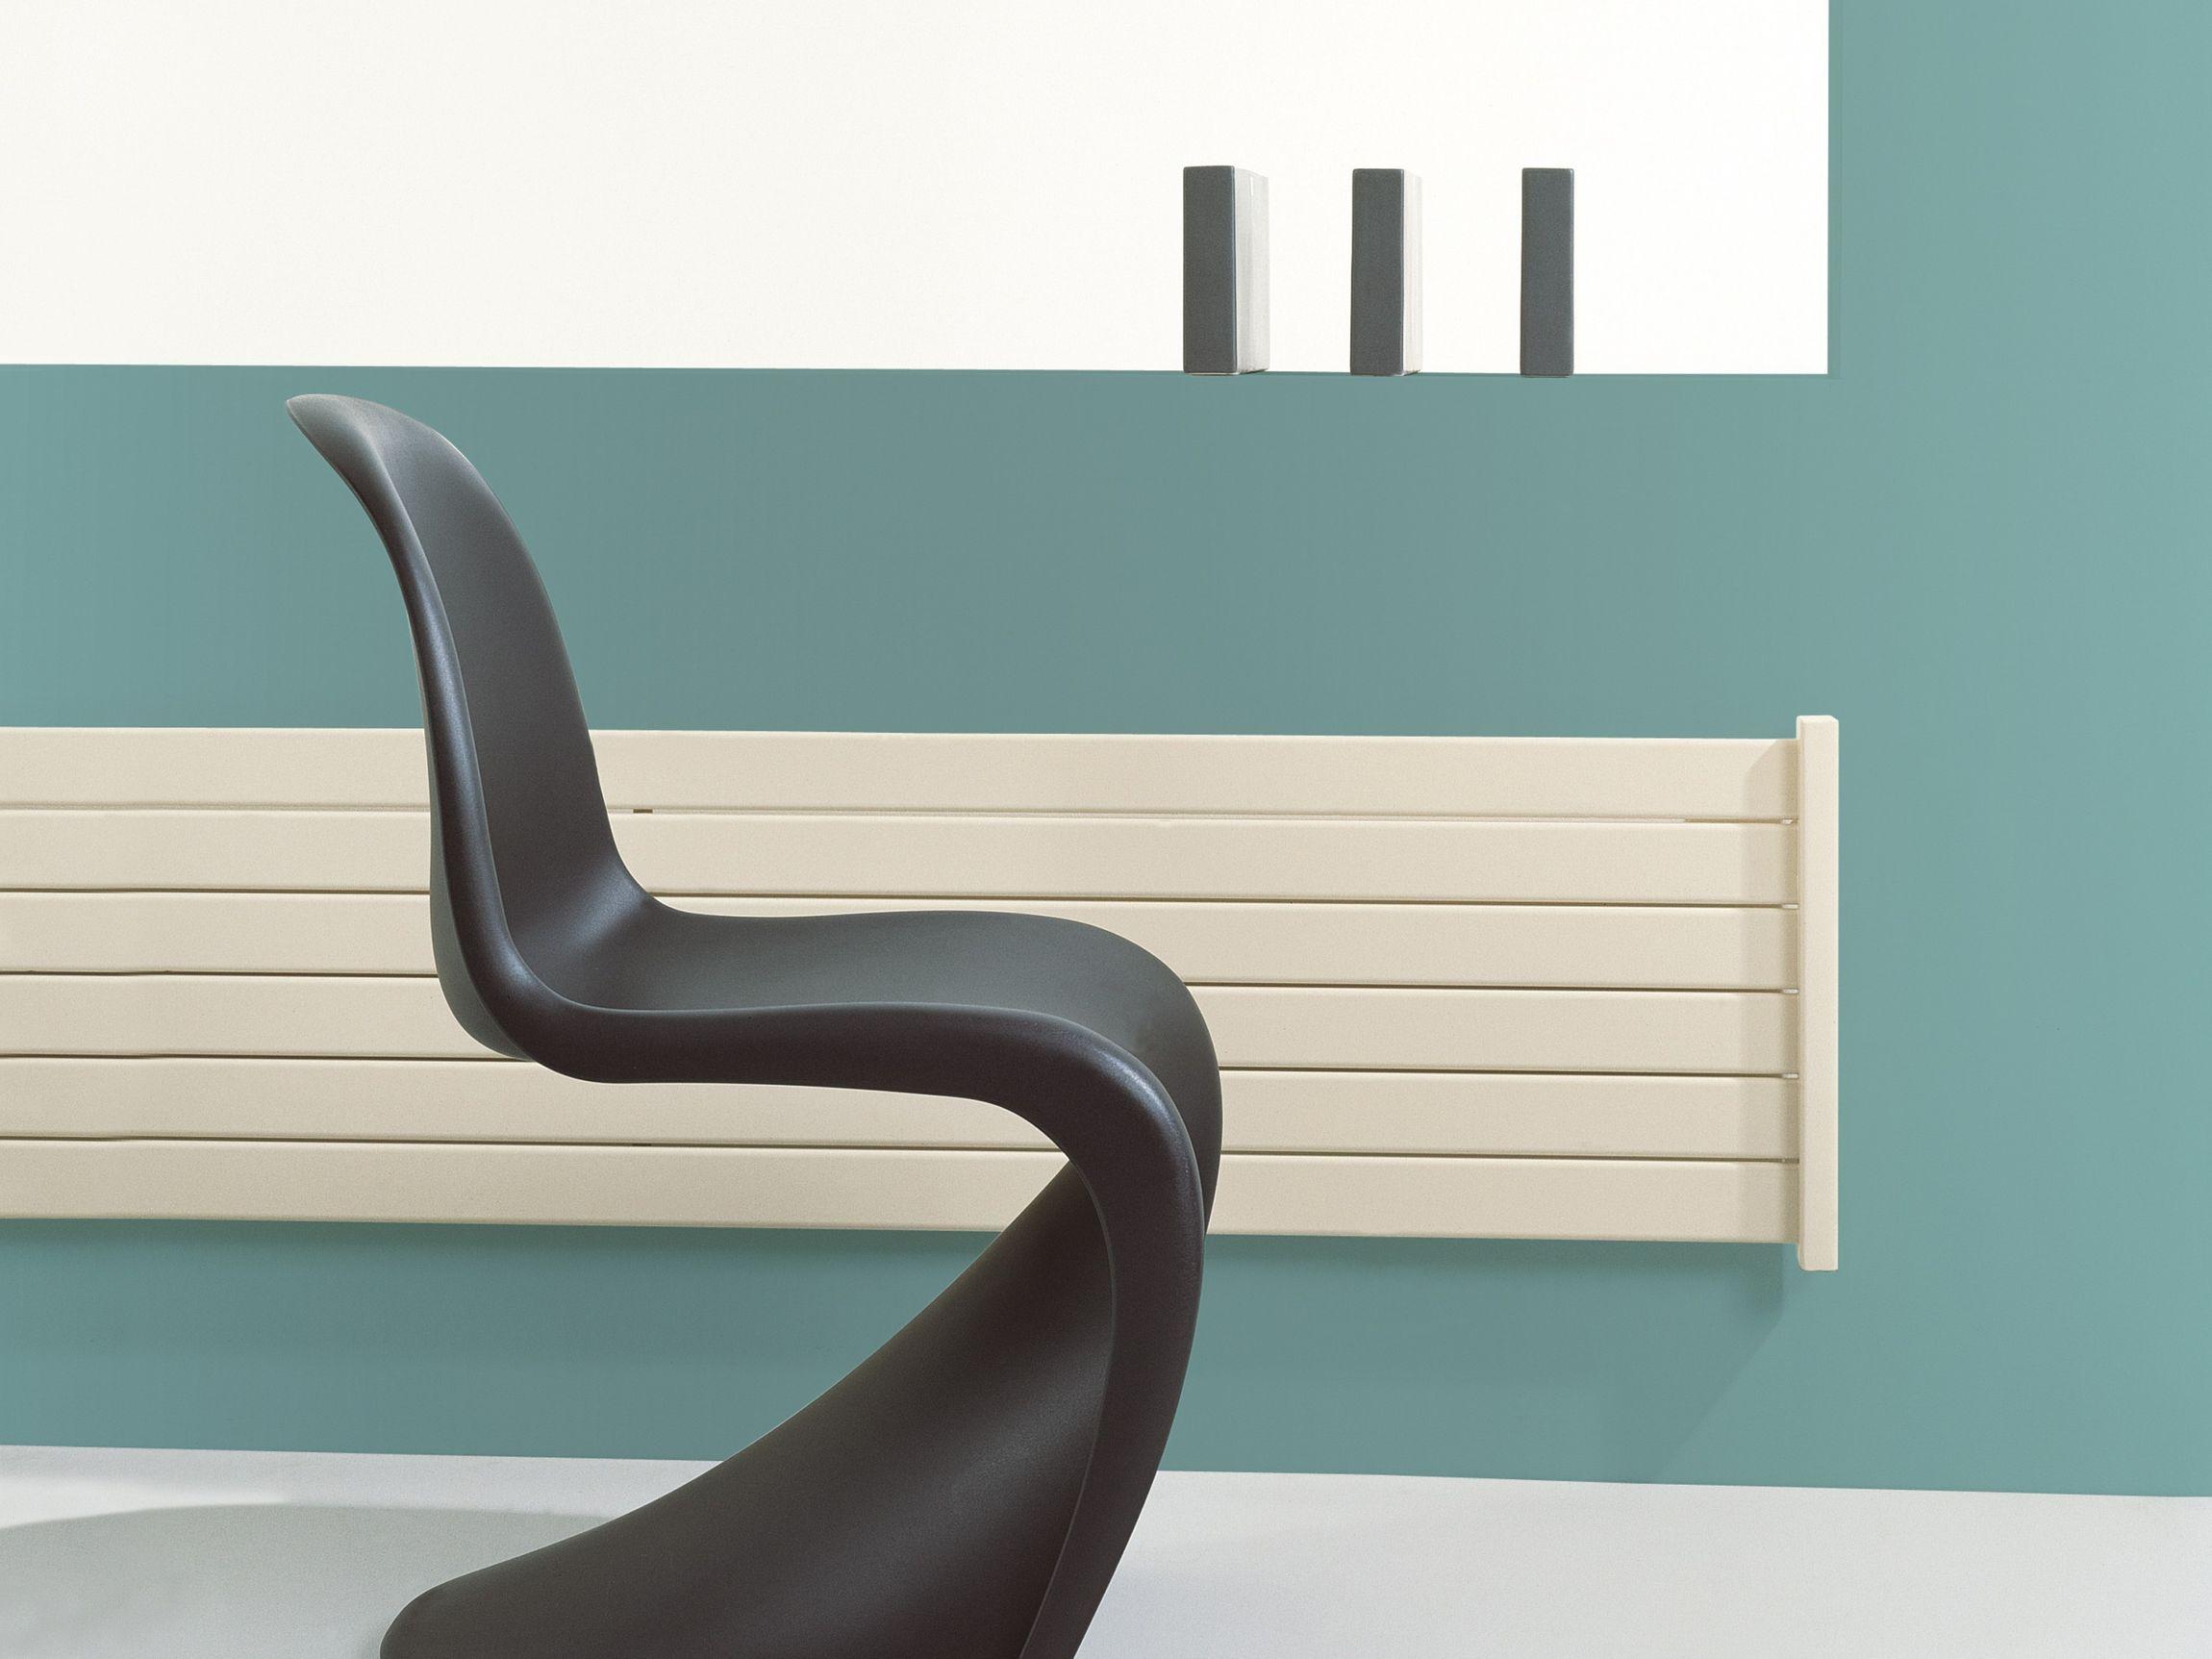 paneelheizk rper 40 x11 x ab 100 cm ab 757 watt heizk rper heizk rper paneel paneelheizk rper. Black Bedroom Furniture Sets. Home Design Ideas